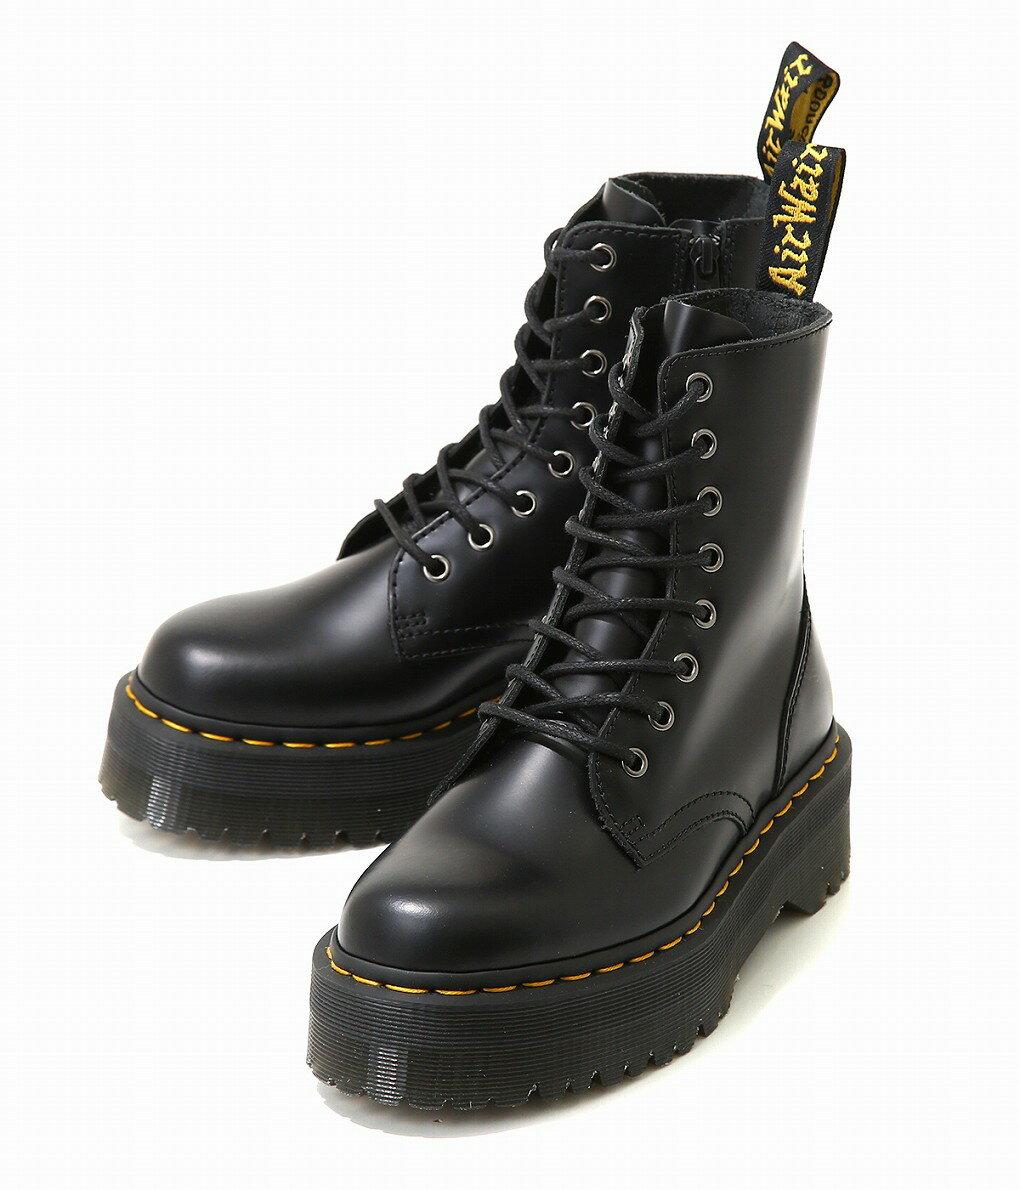 Dr.Martens / ドクターマーチン : JADON : ジェードン シューズ ドクターマーチン 靴 ブーツ : 152655001 【ANN】